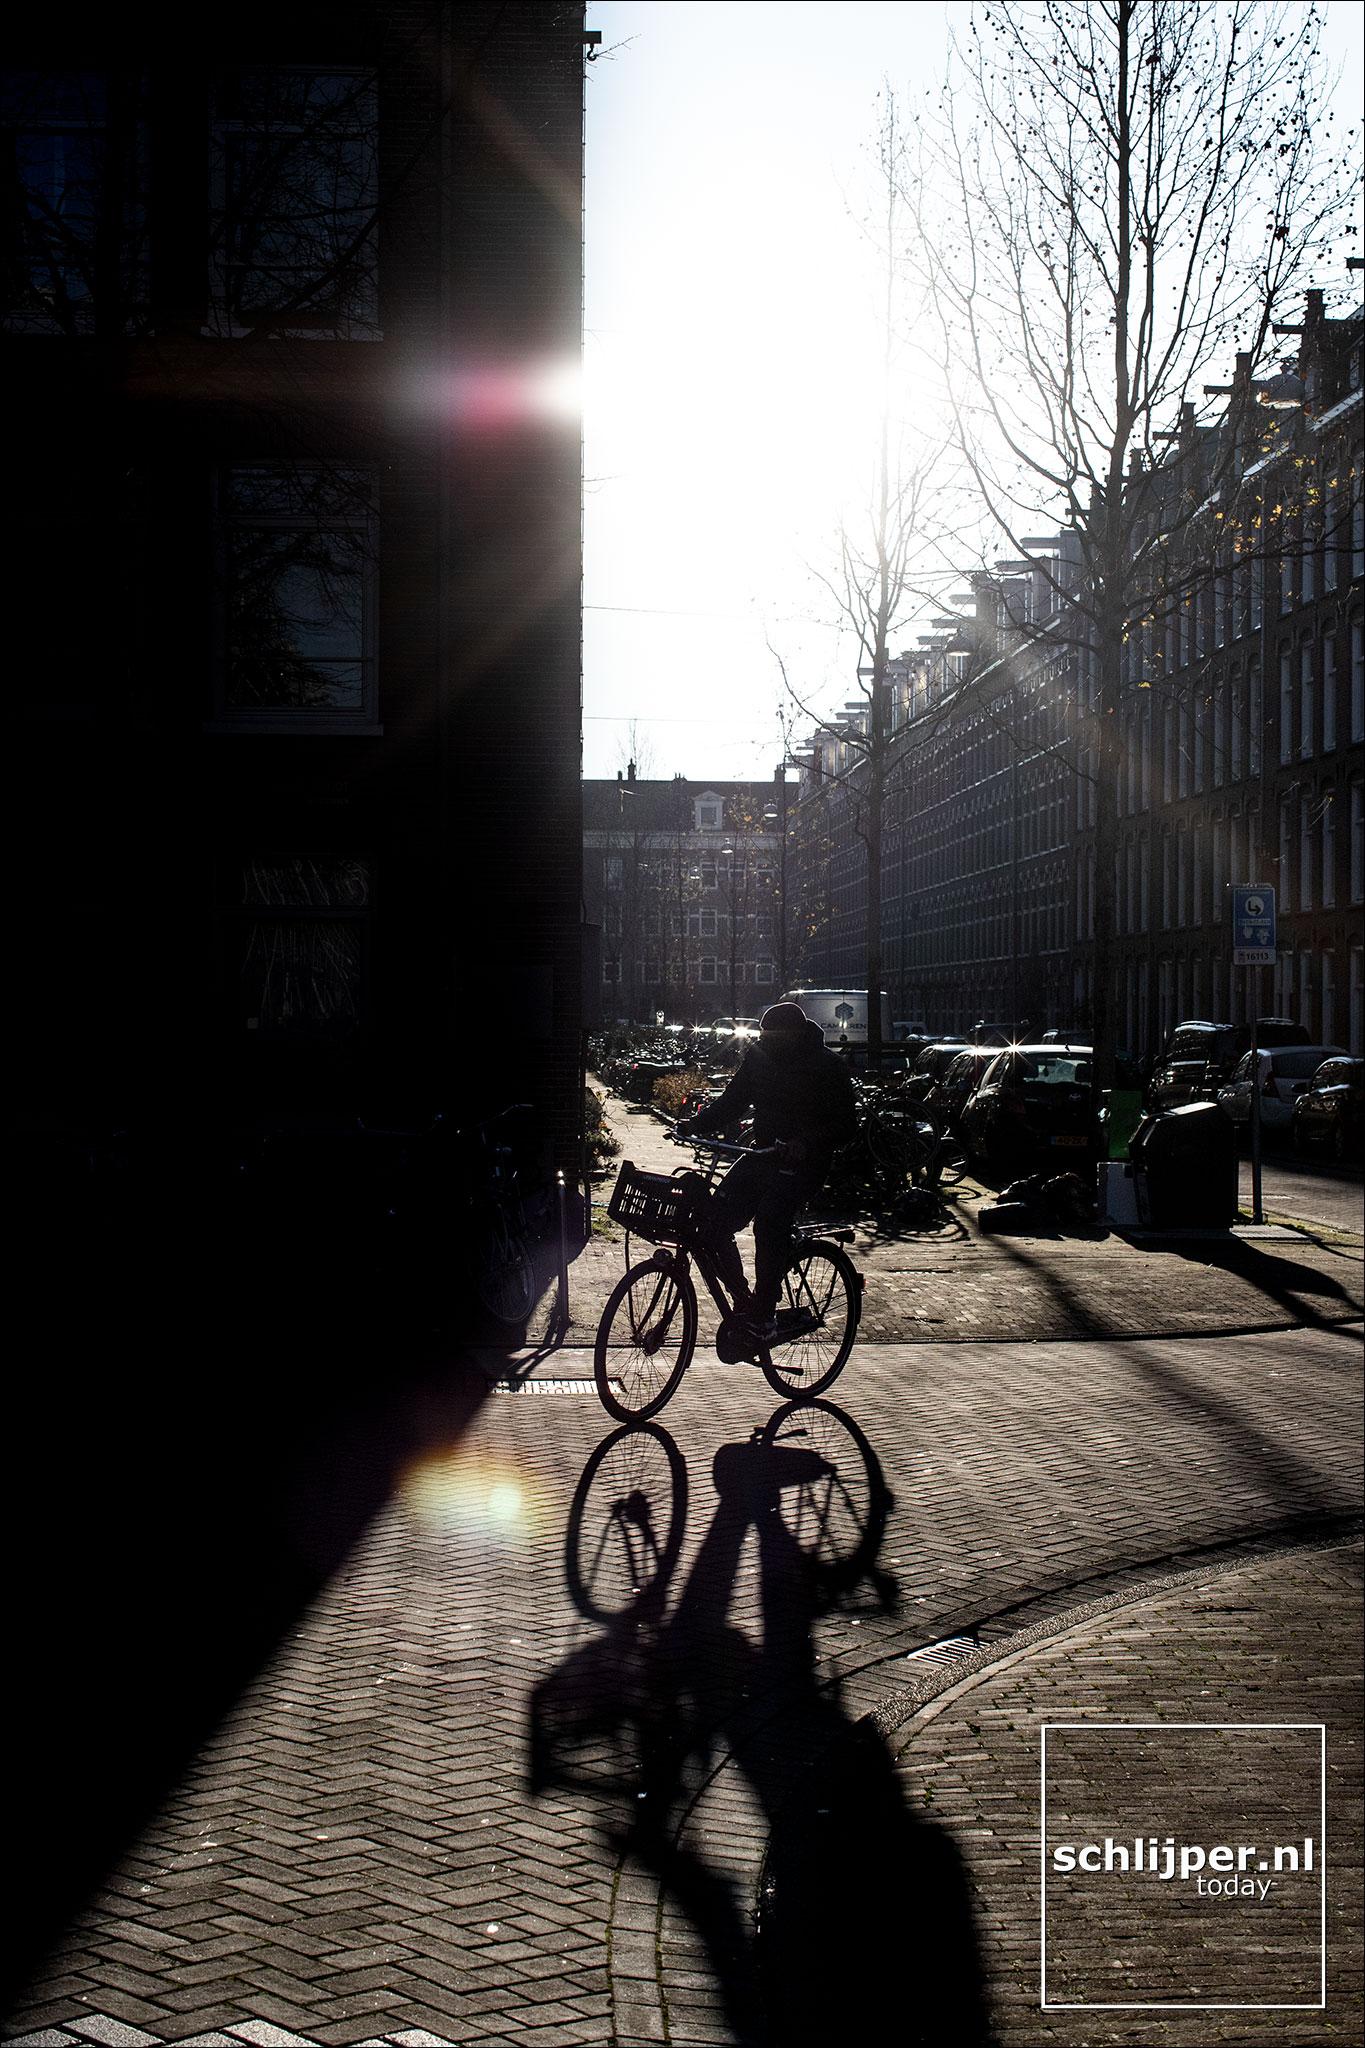 Nederland, Amsterdam, 27 december 2019